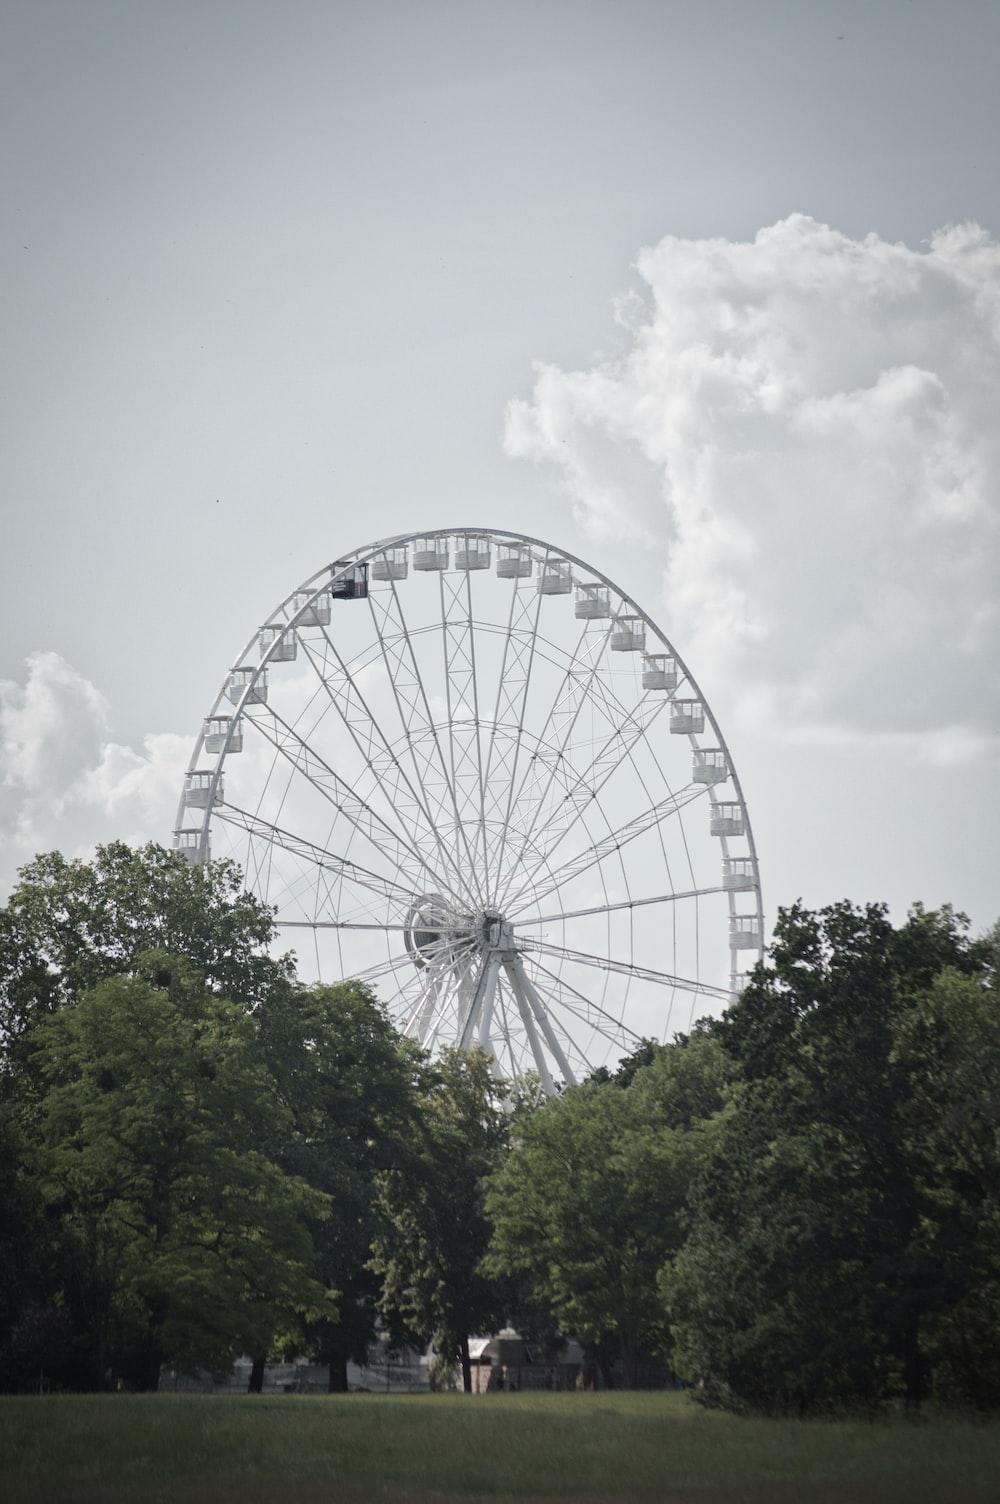 white ferris wheel under cloudy sky during daytime